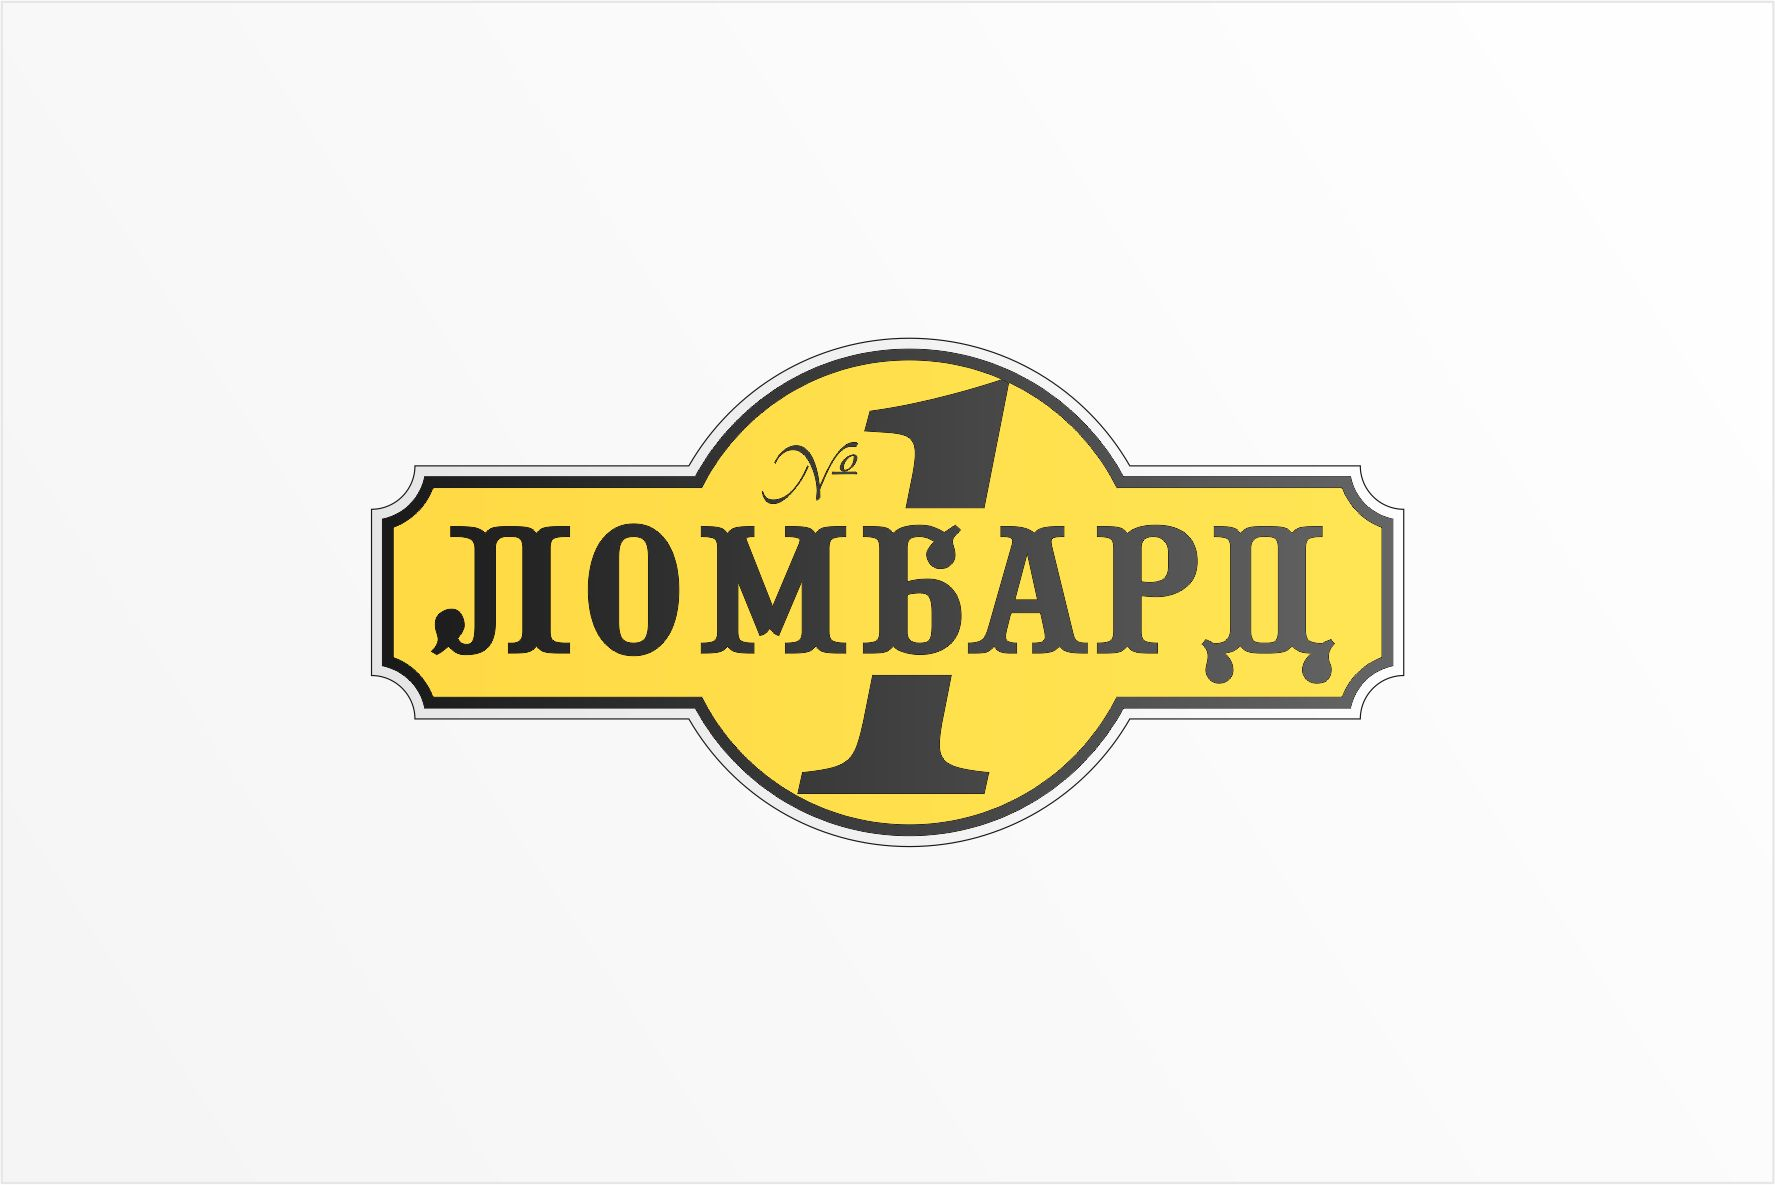 Дизайн логотипа Ломбард №1 - дизайнер V_V